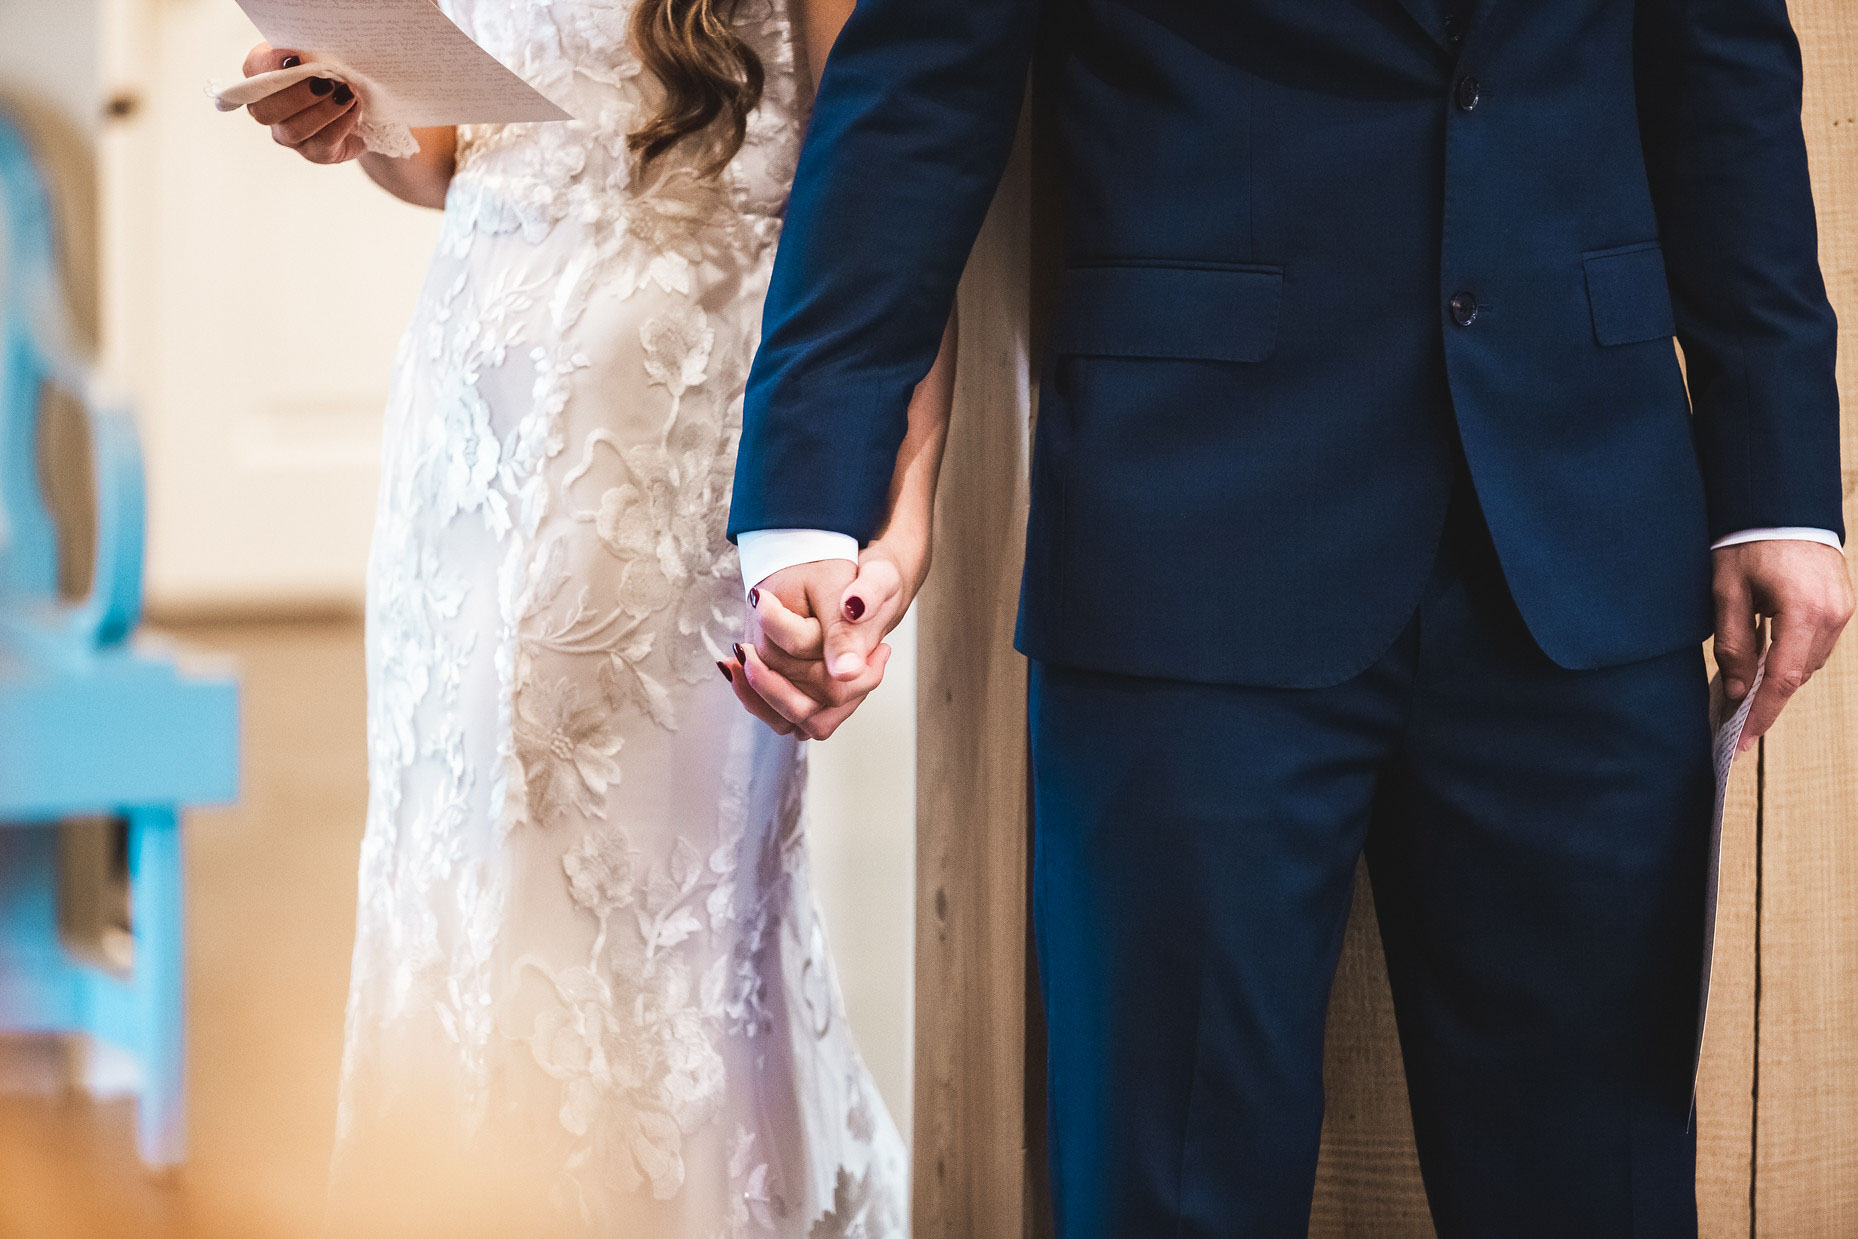 adam-szarmack-bowing-oaks-wedding-photographer-jacksonville-67.jpg